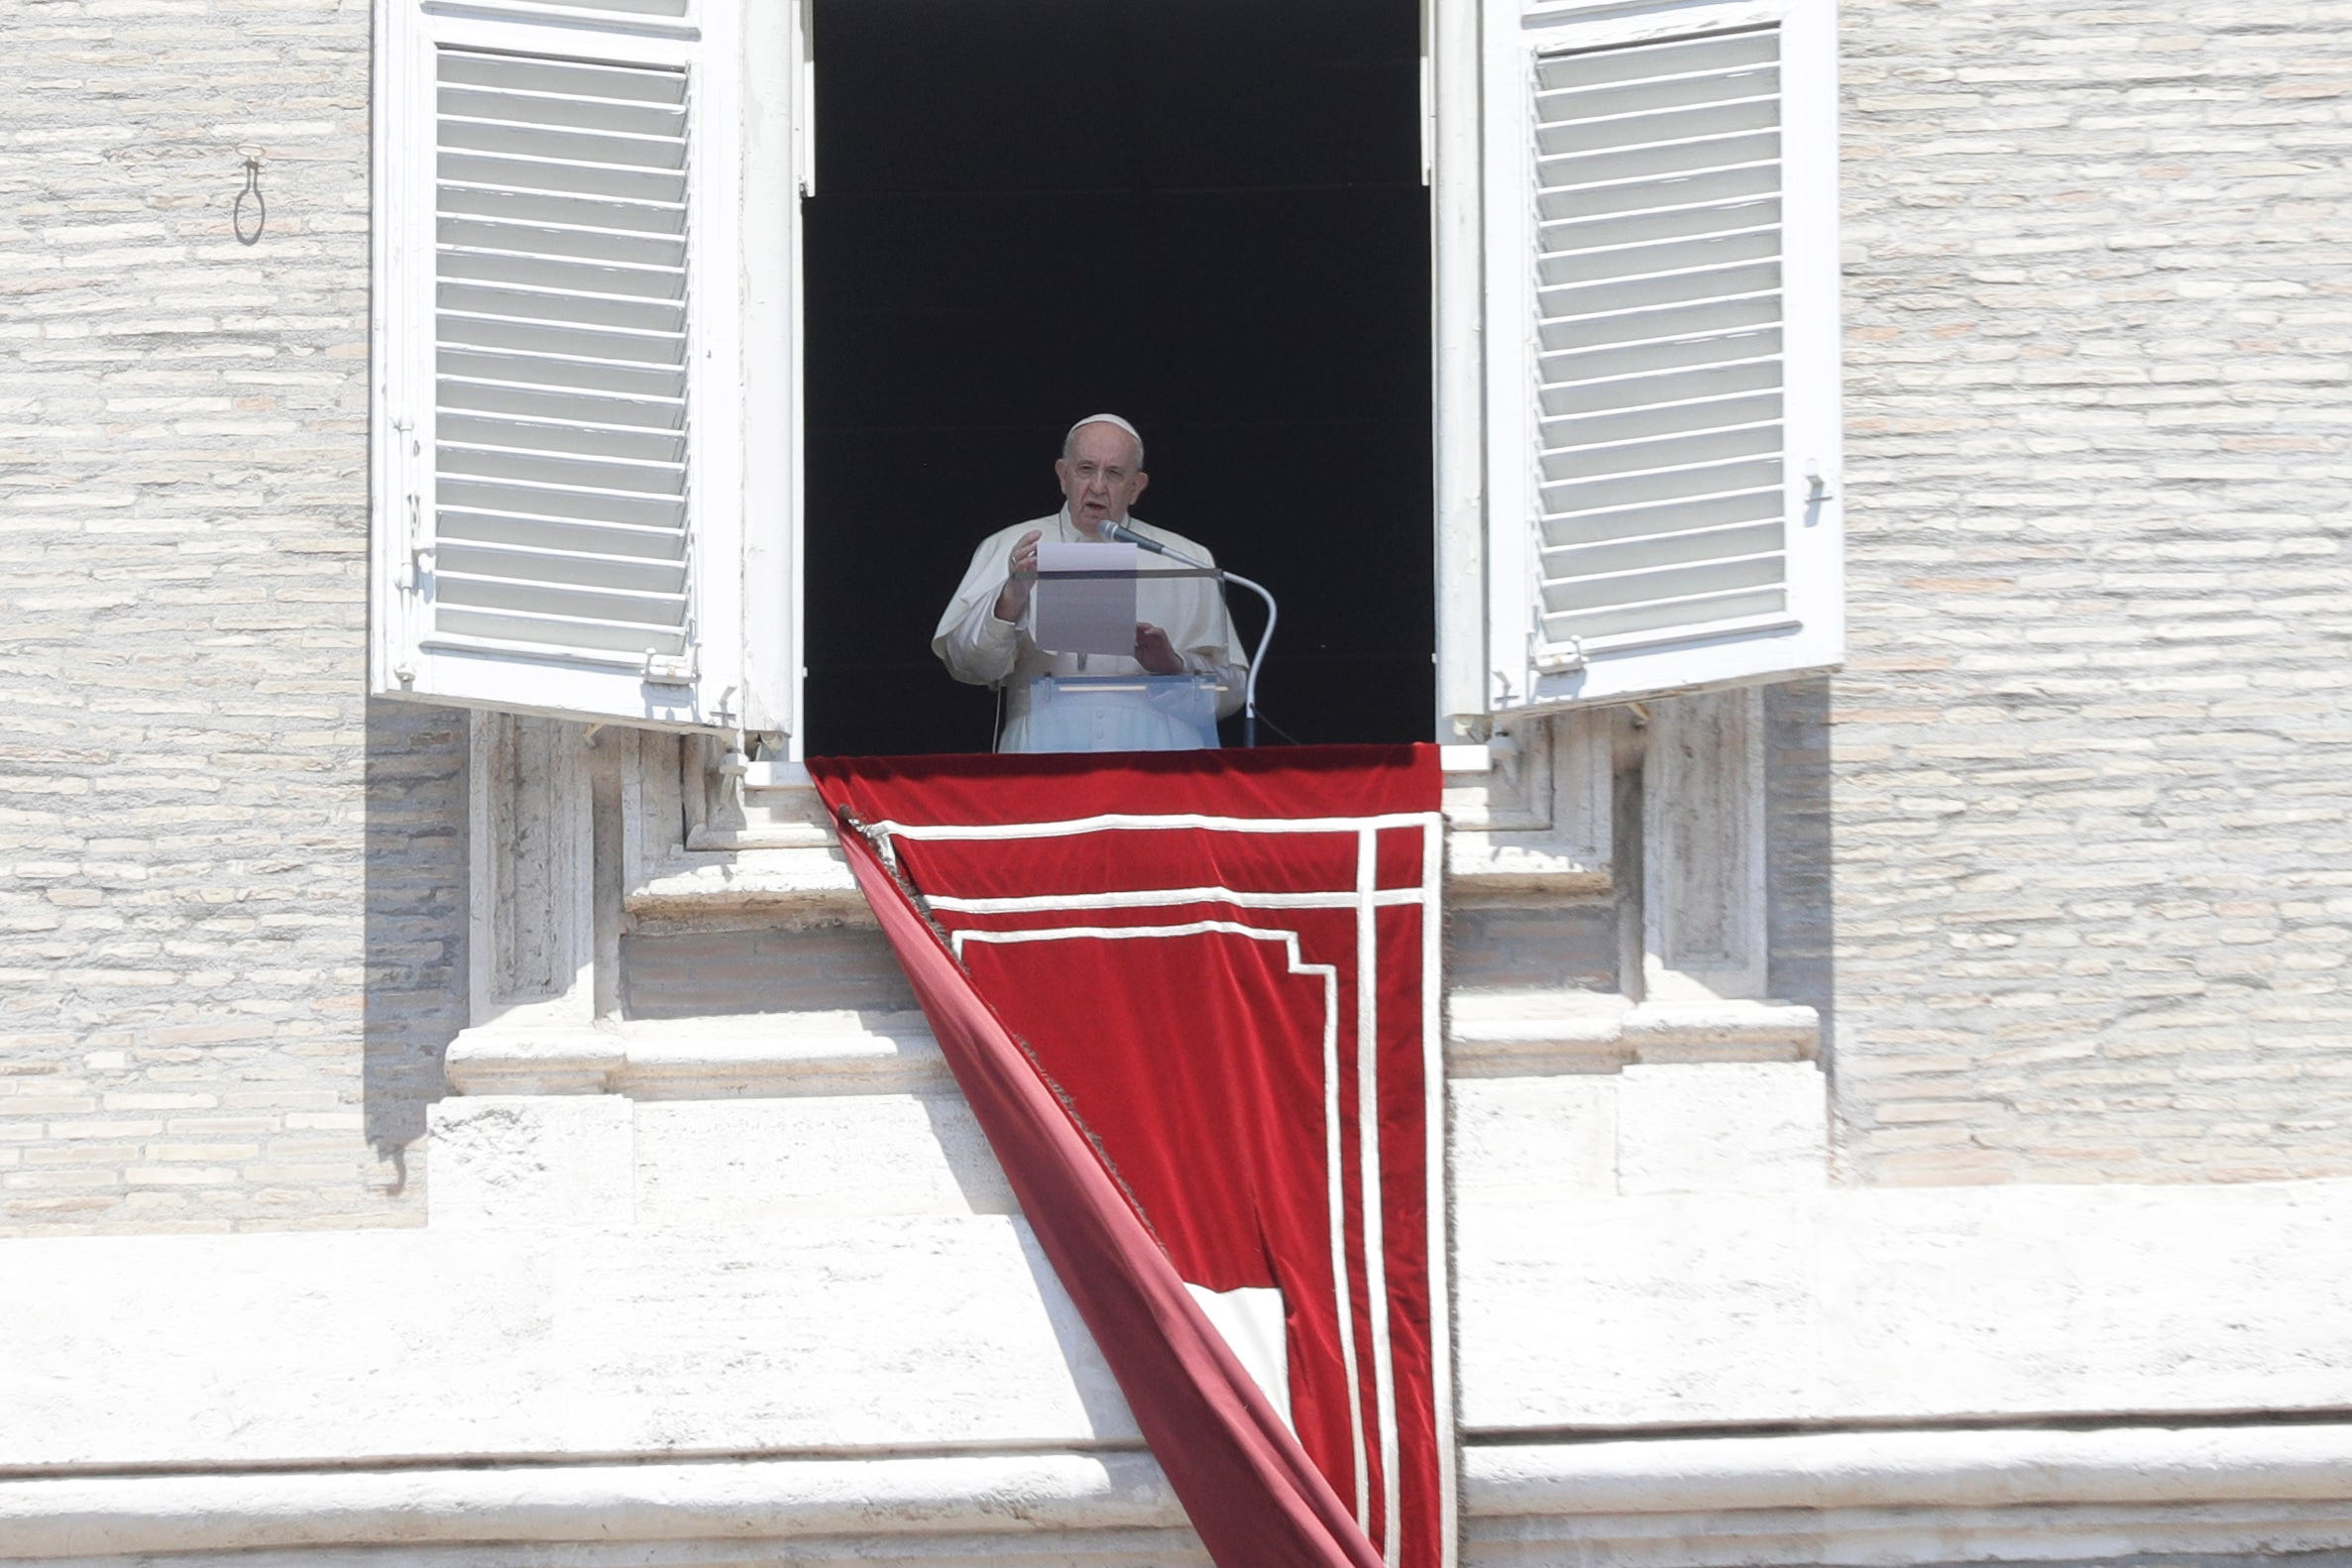 Judge slain in Sicily by mafiosi put on path to sainthood 2